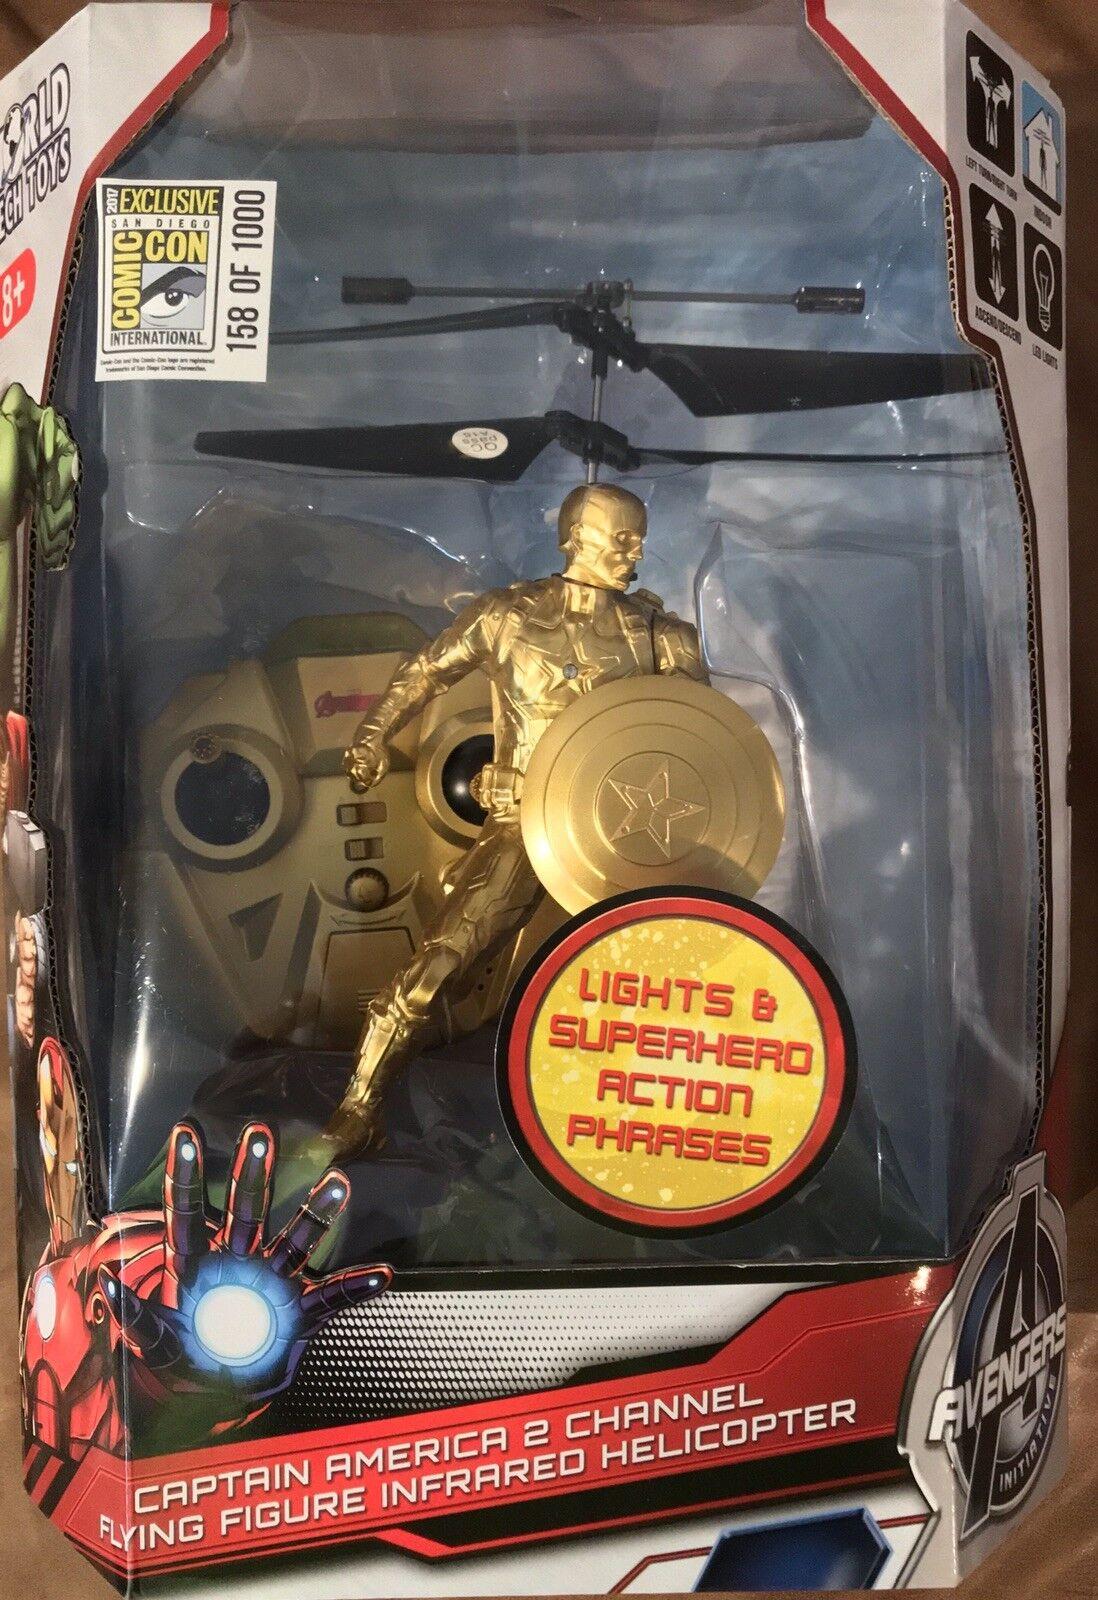 Comic - con ccsd exklusive 17 marvel - 158   1000 captain america - hubschrauber